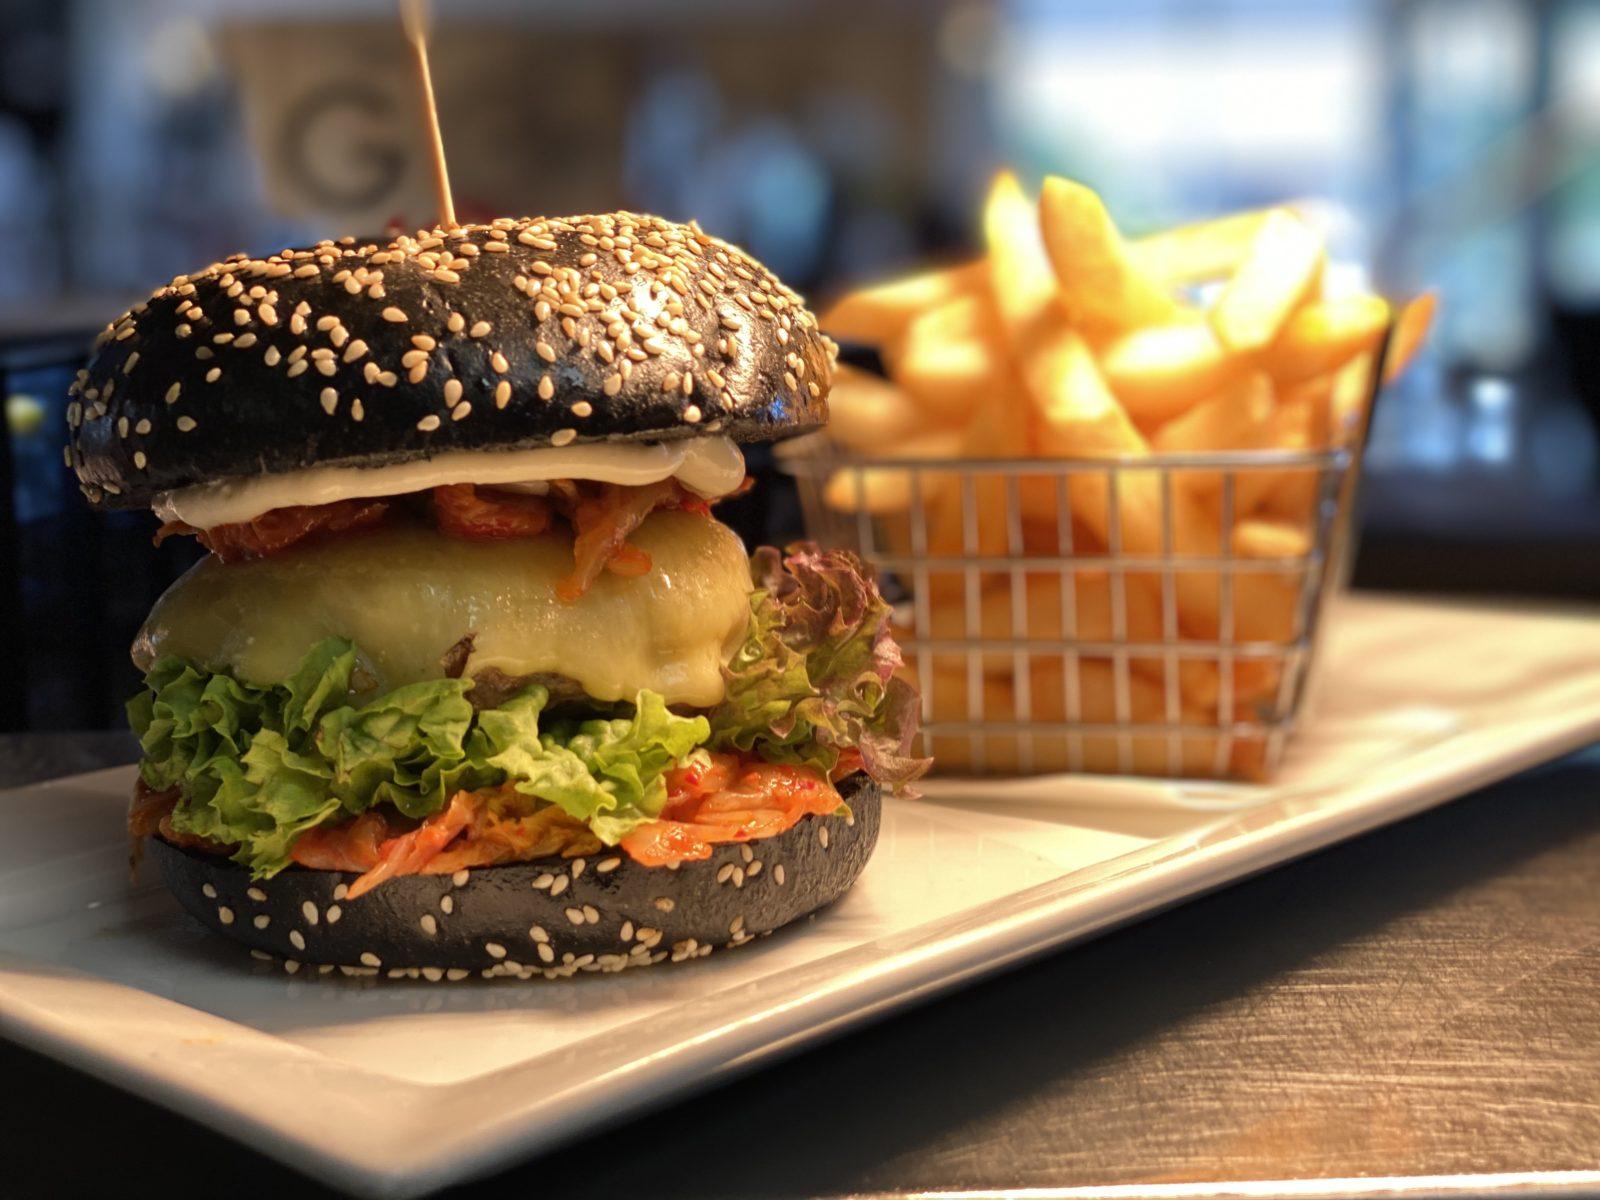 burger cheeseburger cheese lettuce kimchi korean asian style activate charcoal bun black bun fries tasty rolleston burger place